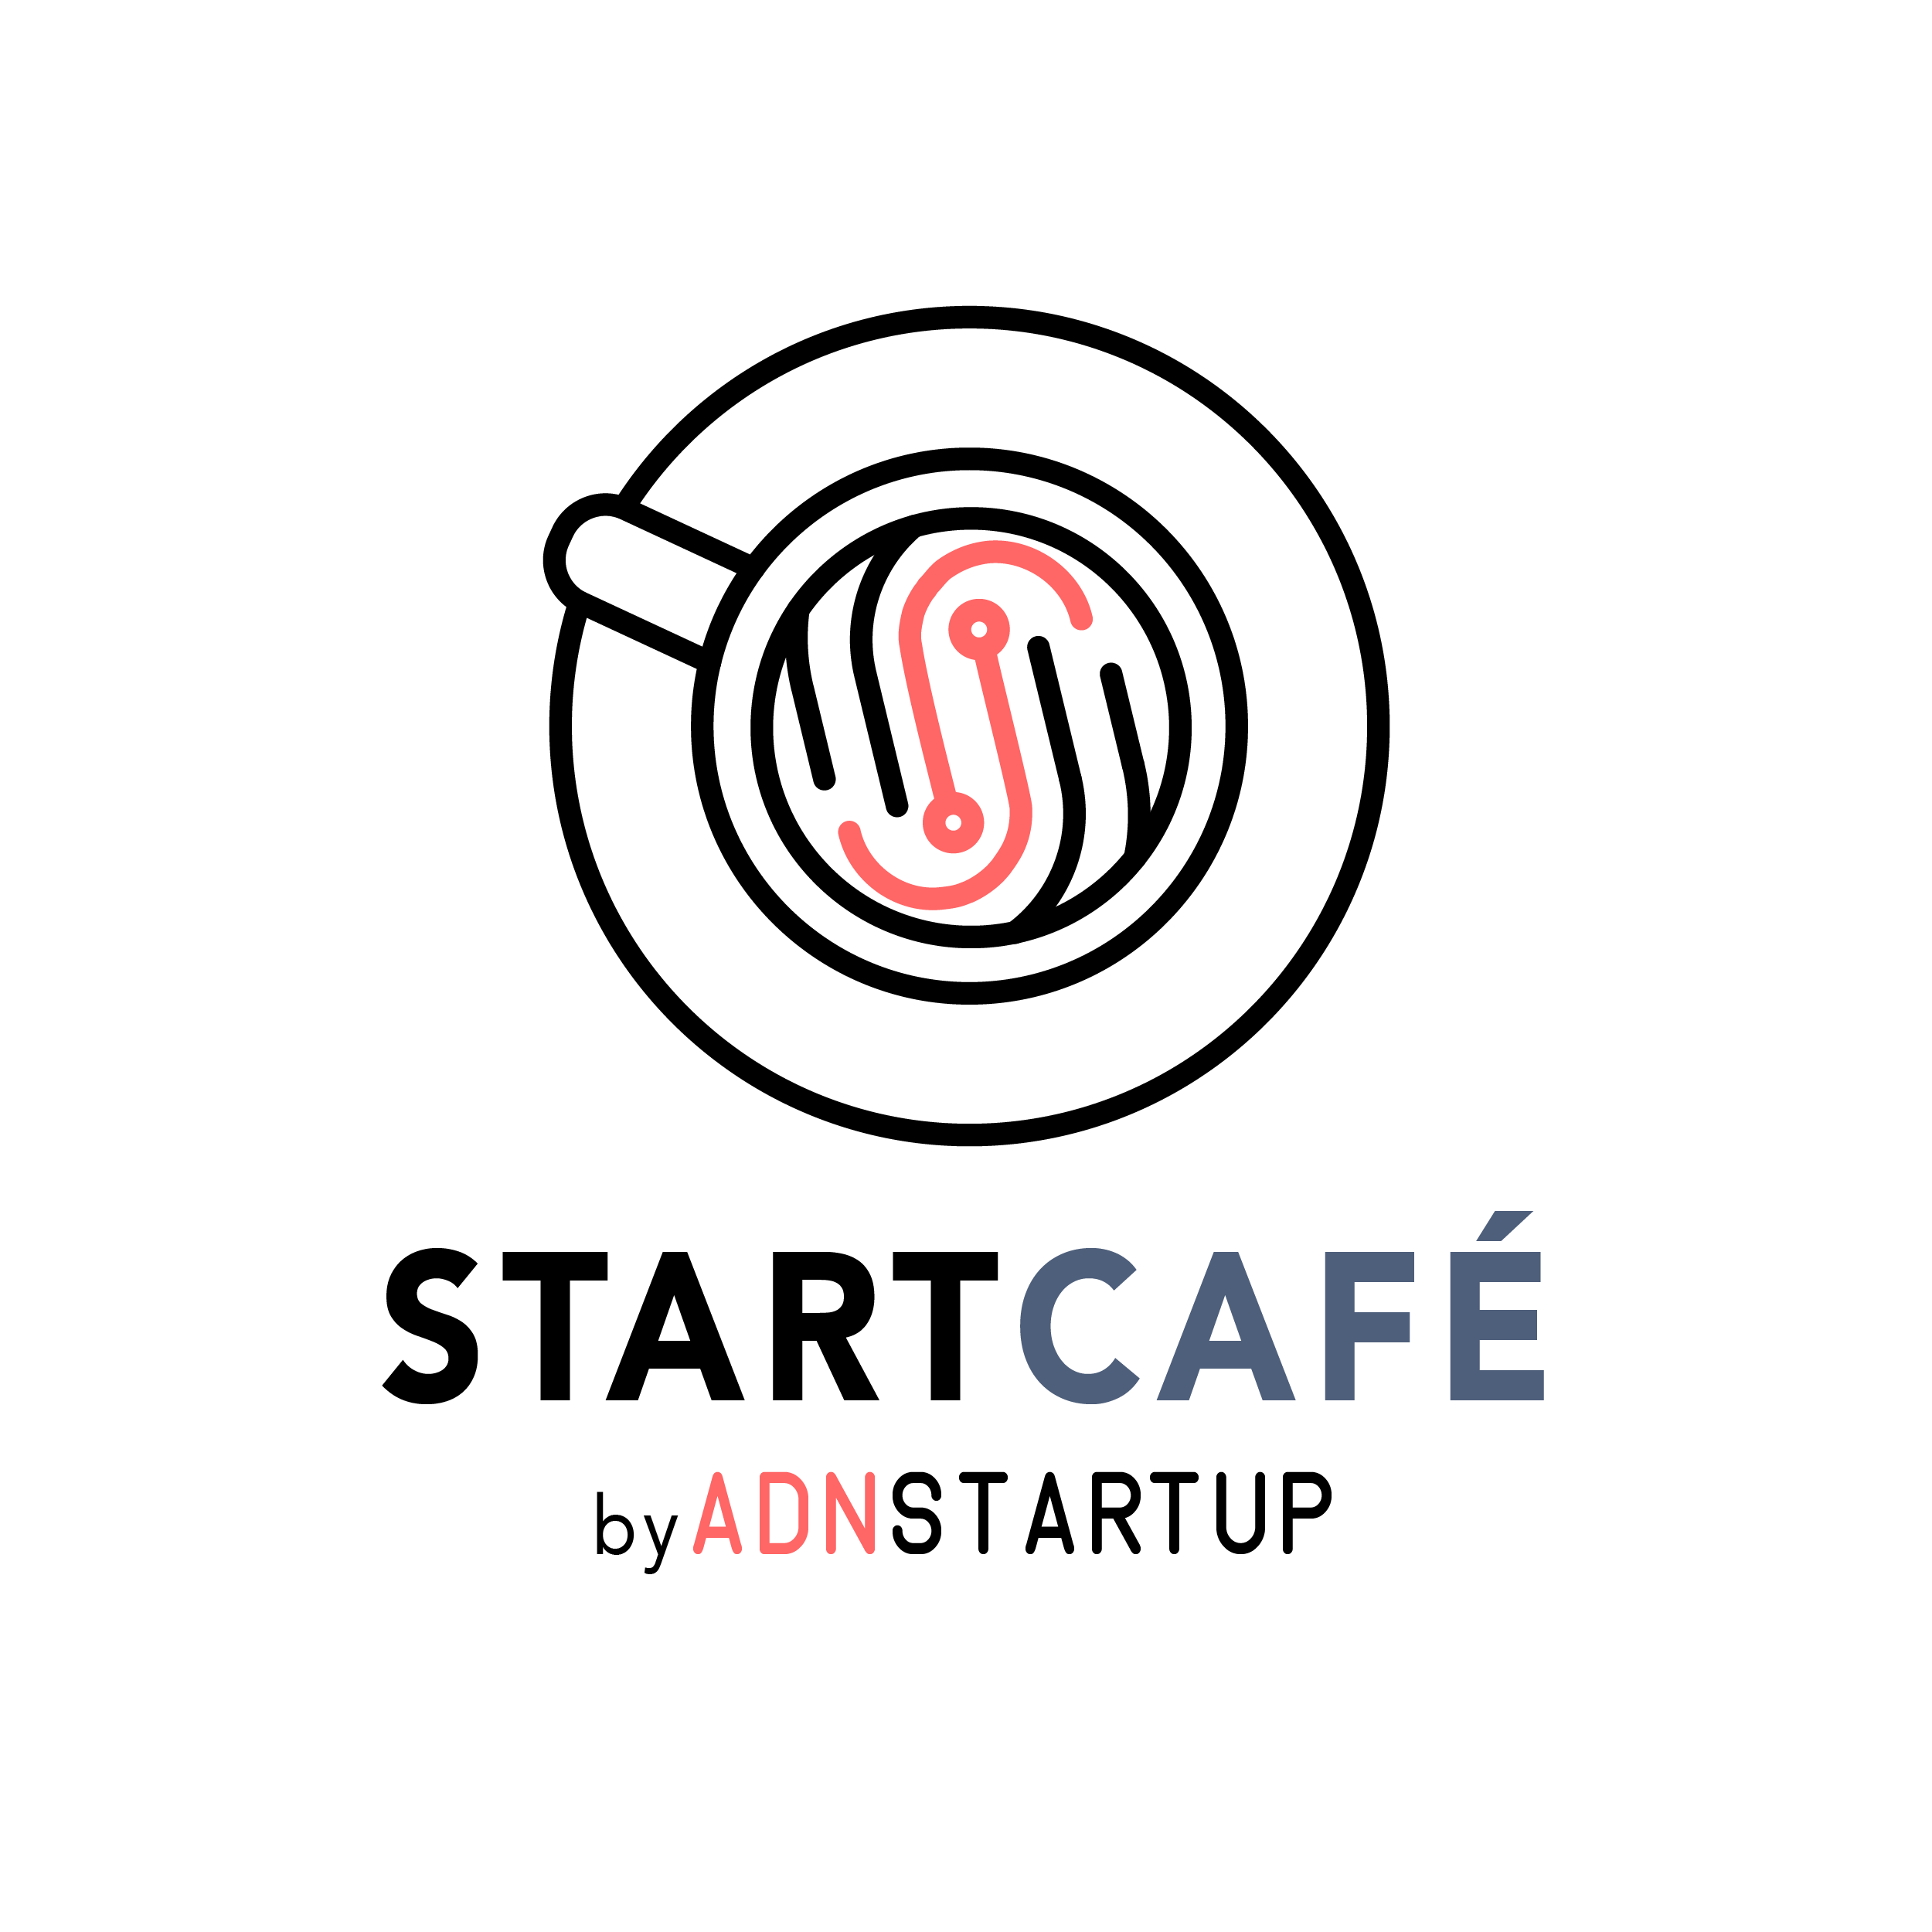 Logo-startcafé